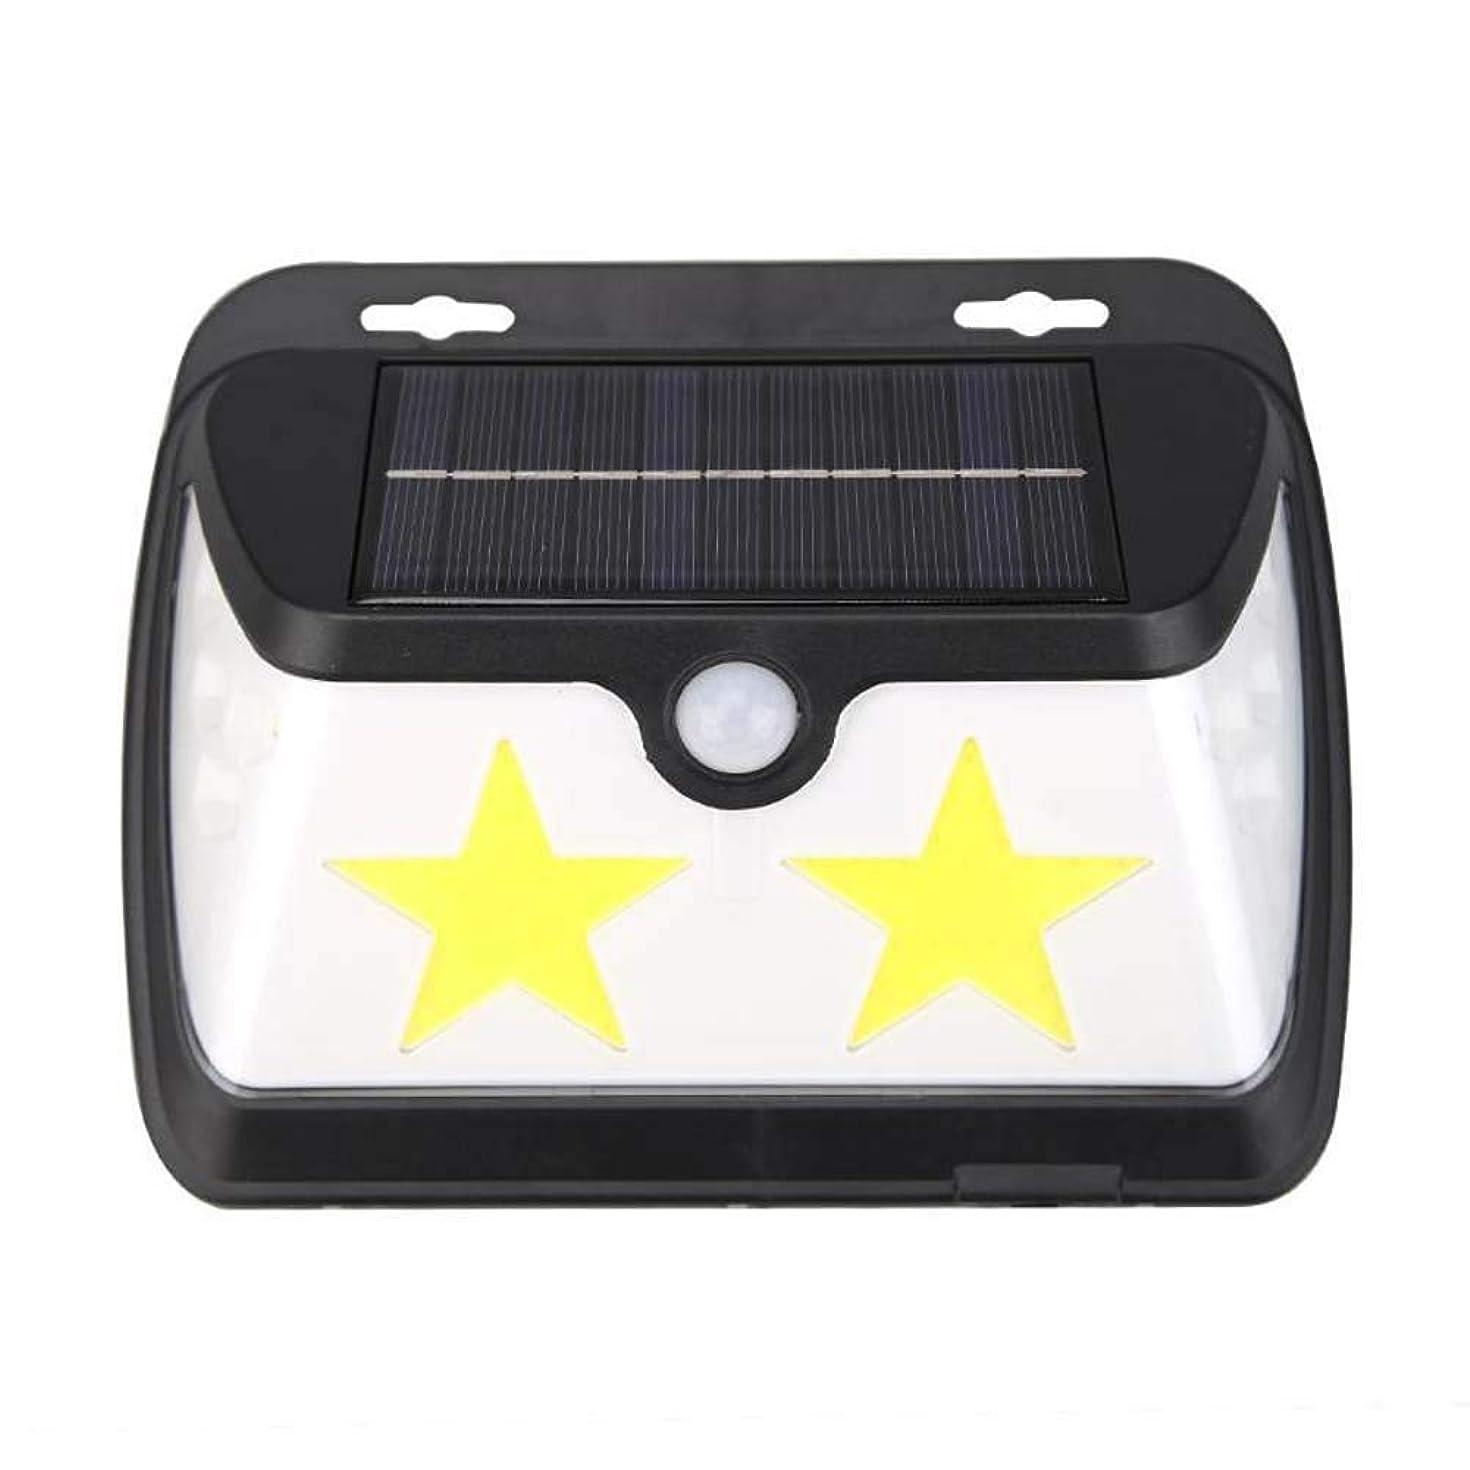 XNCH Solar Lights Outdoor, LED Solar Motion Sensor Security Lights, 3 Modes, Solar Powered Lights Waterproof Wireless Wall LightsSolar Garden Light